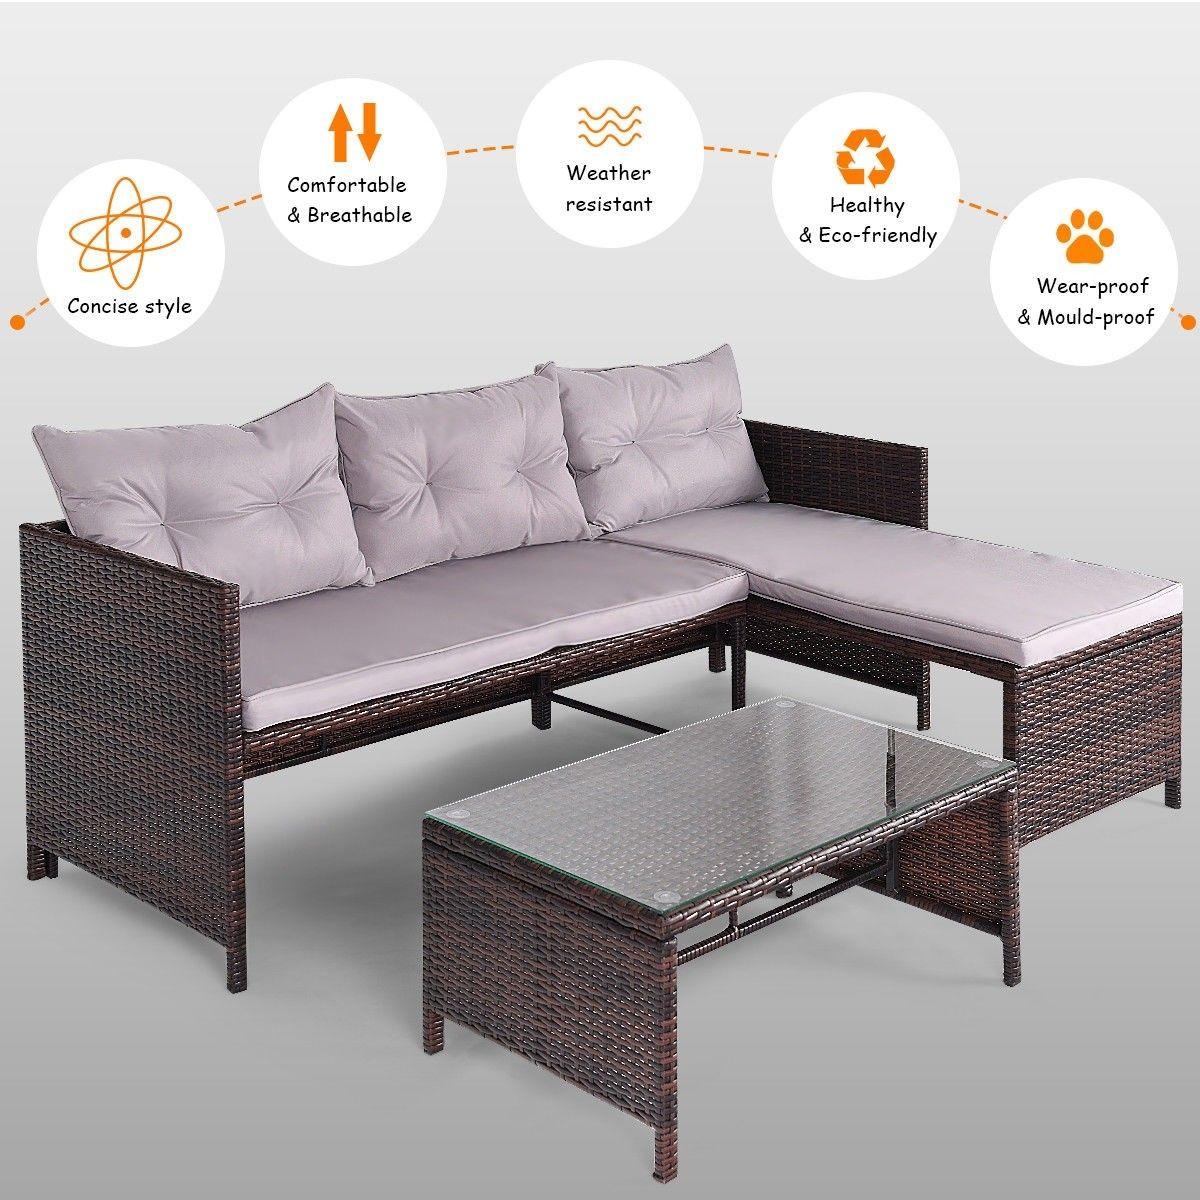 3 Pcs Rattan Wicker Deck Couch Outdoor Patio Sofa Set Color Mix